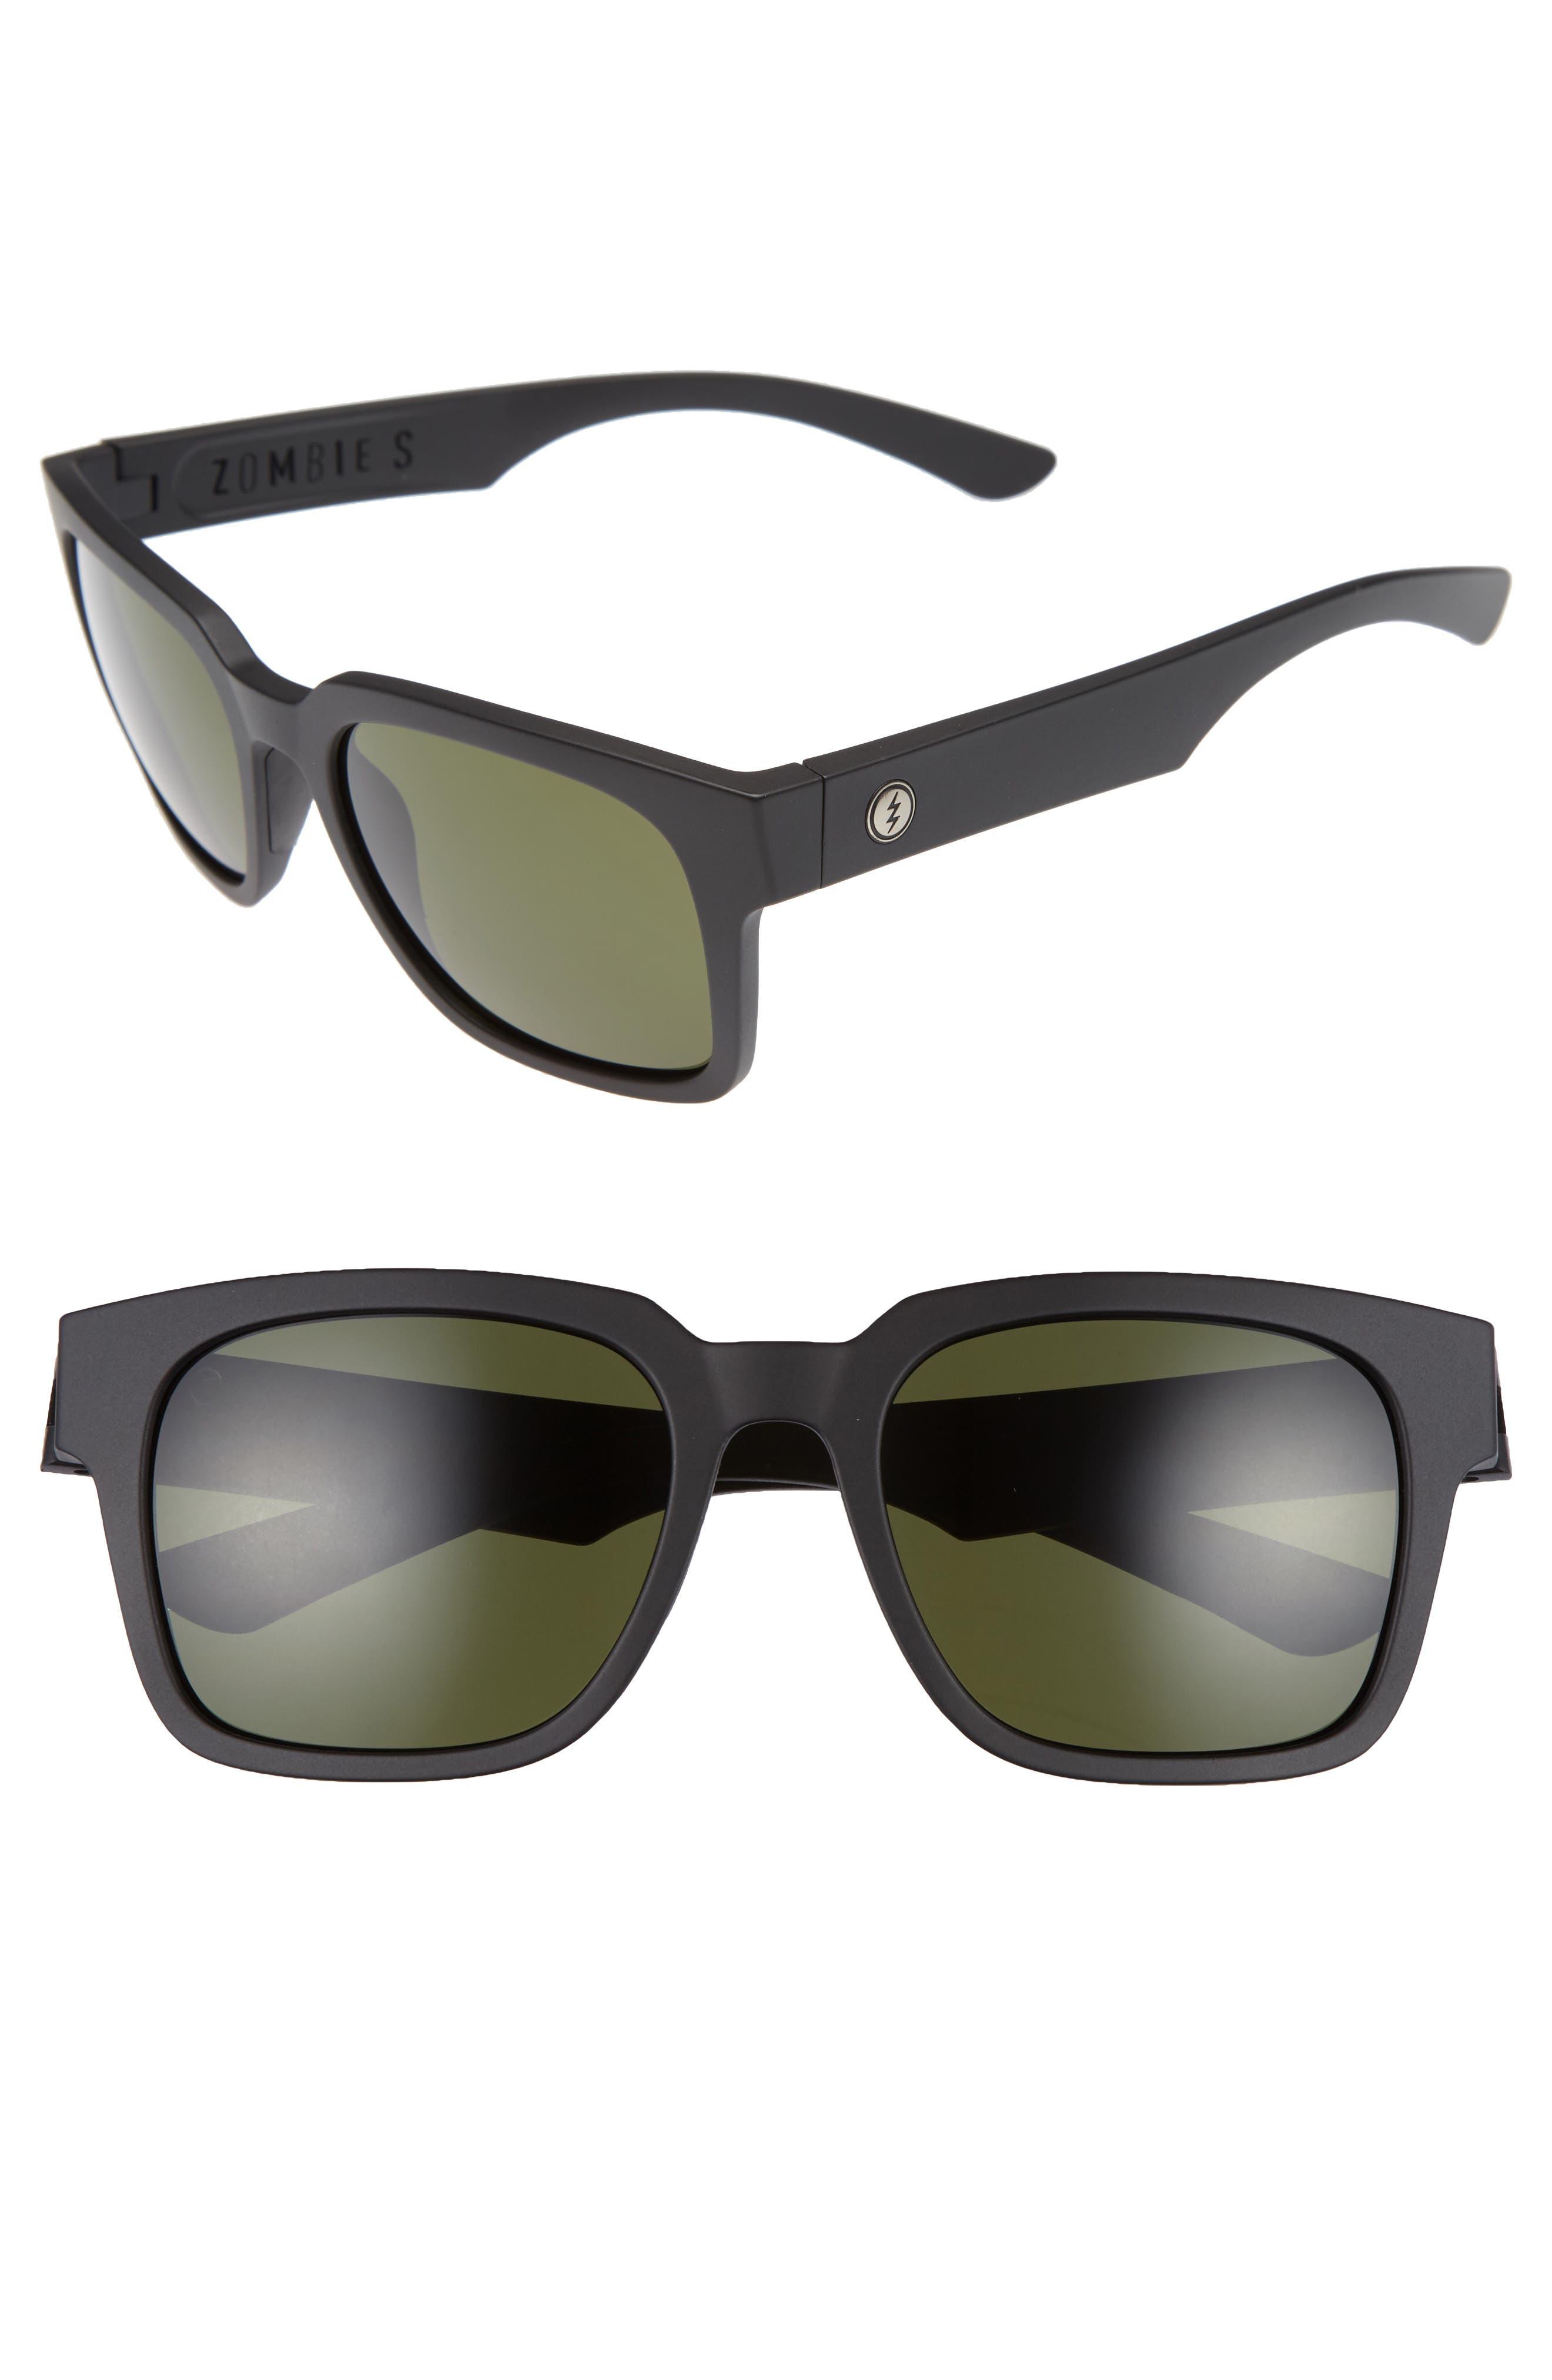 Zombie S 52mm Sunglasses,                             Main thumbnail 1, color,                             001